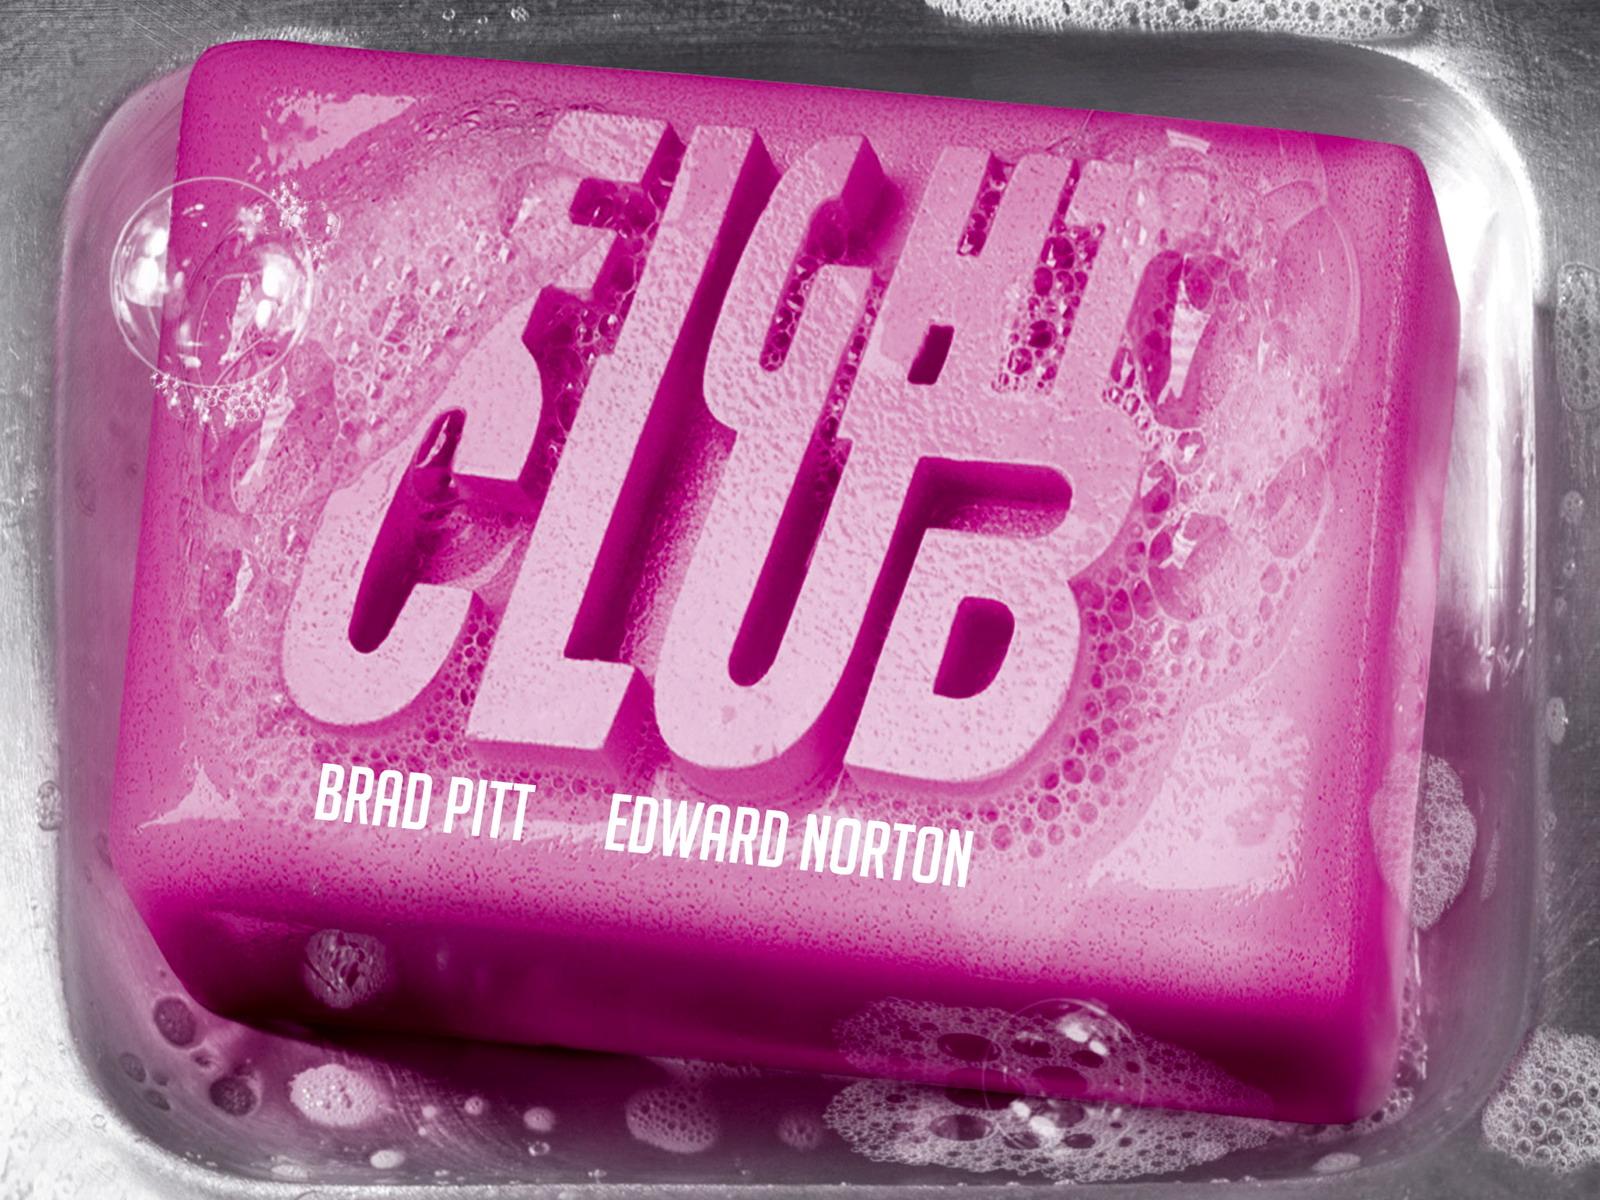 fight-club-fight-club-30856727-1600-1200_1.jpg